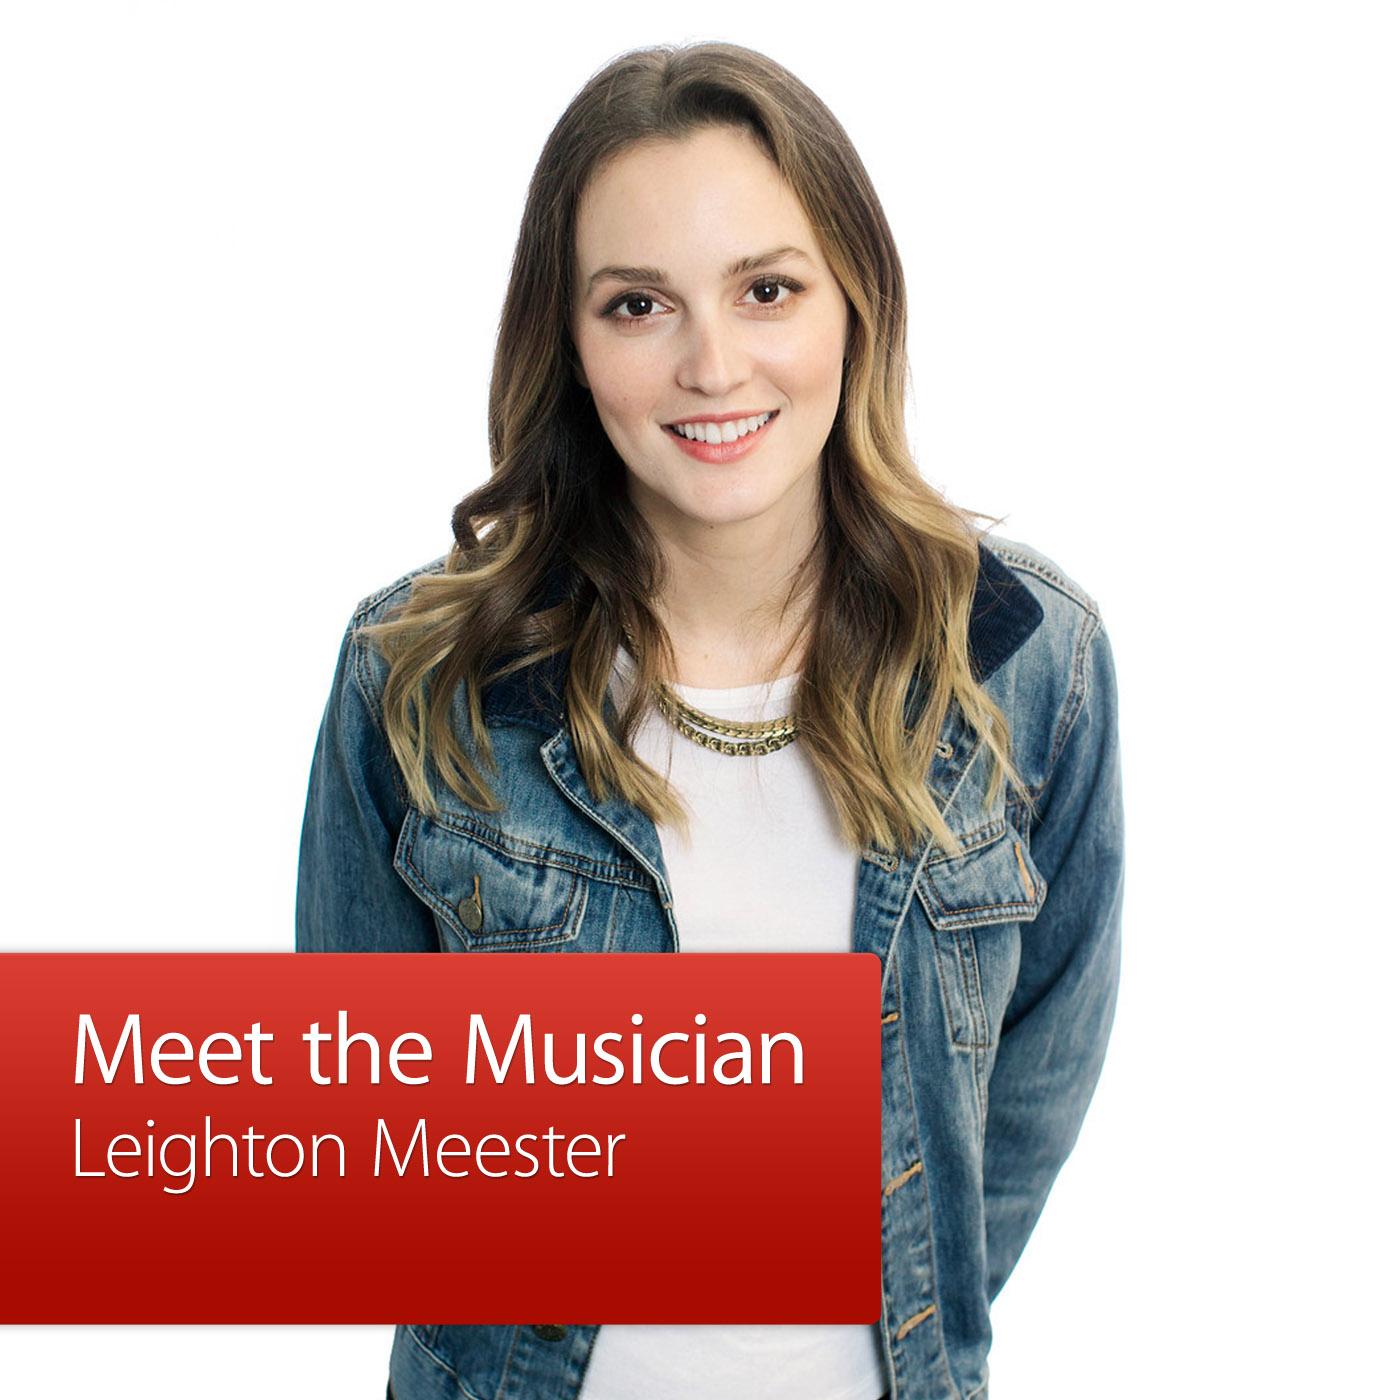 Leighton Meester: Meet the Musician